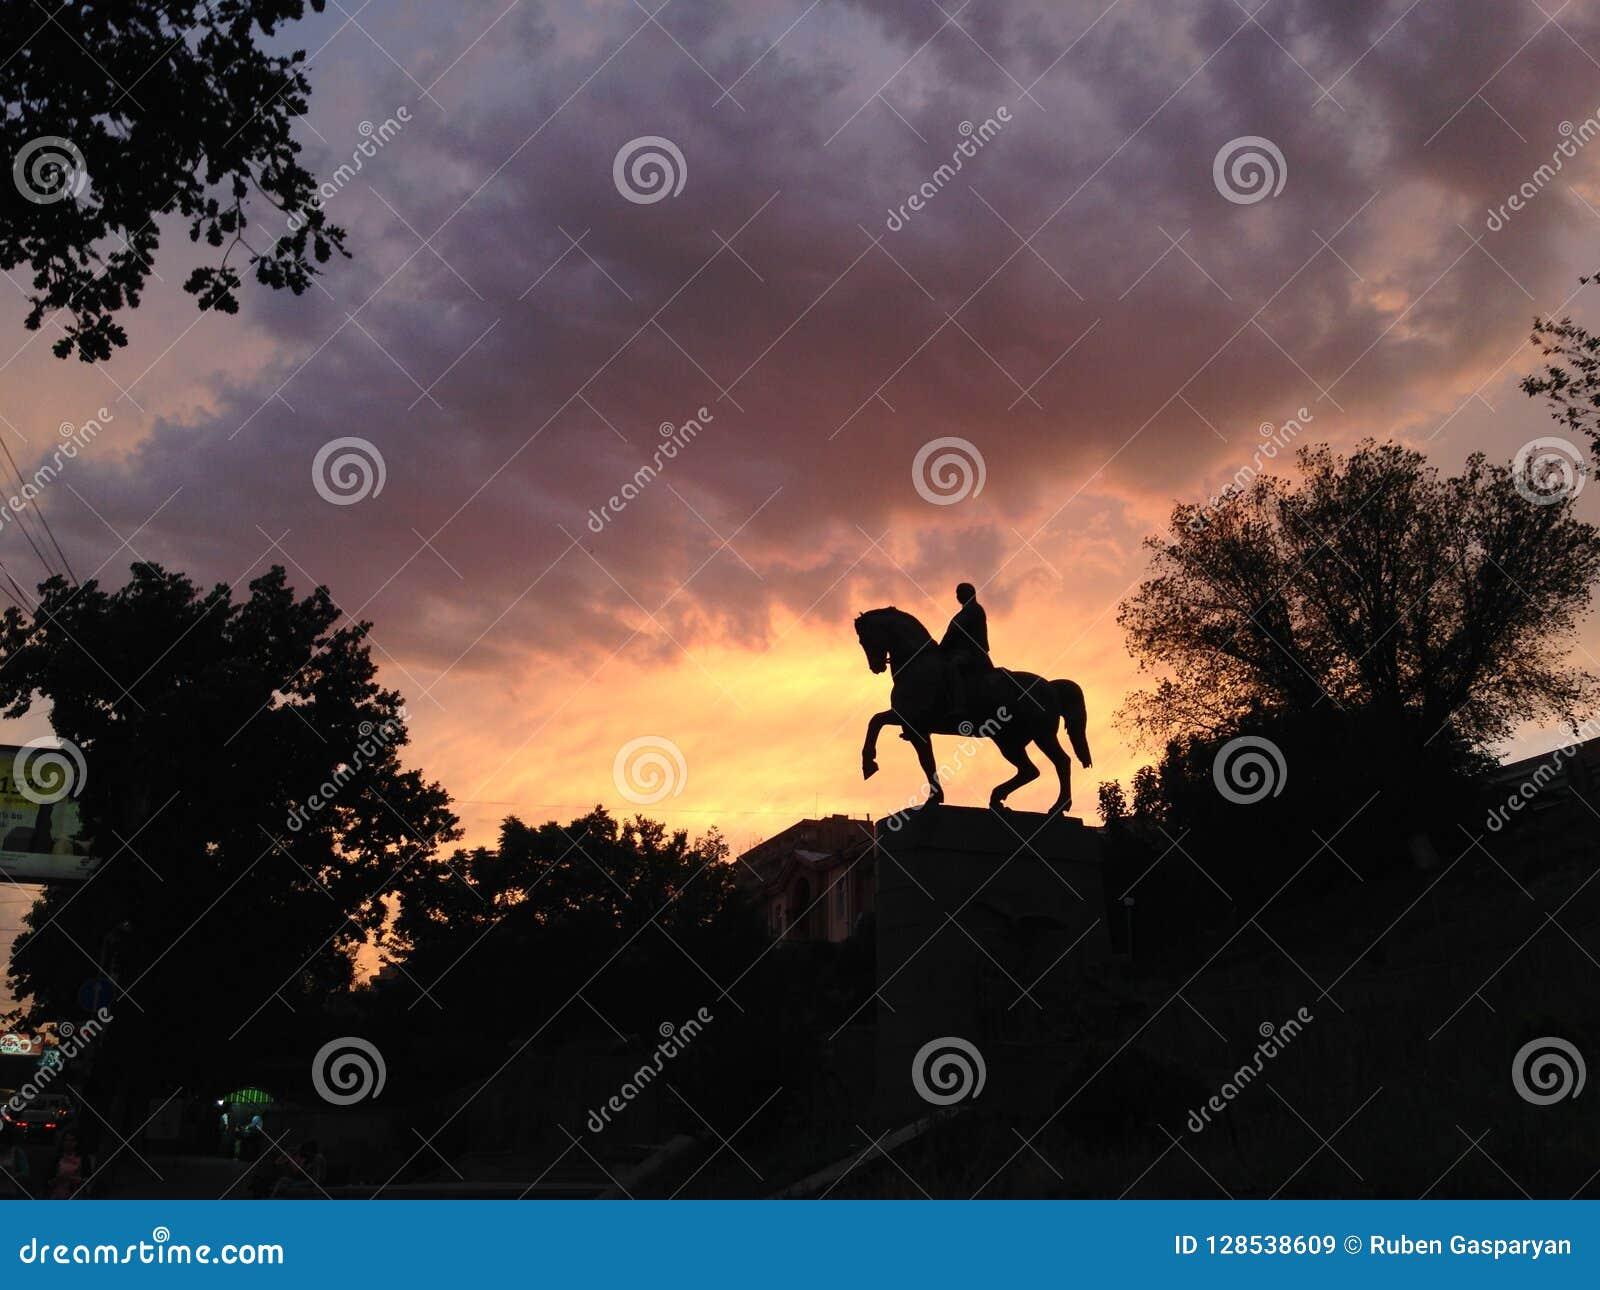 Silhouette of monument of horseman